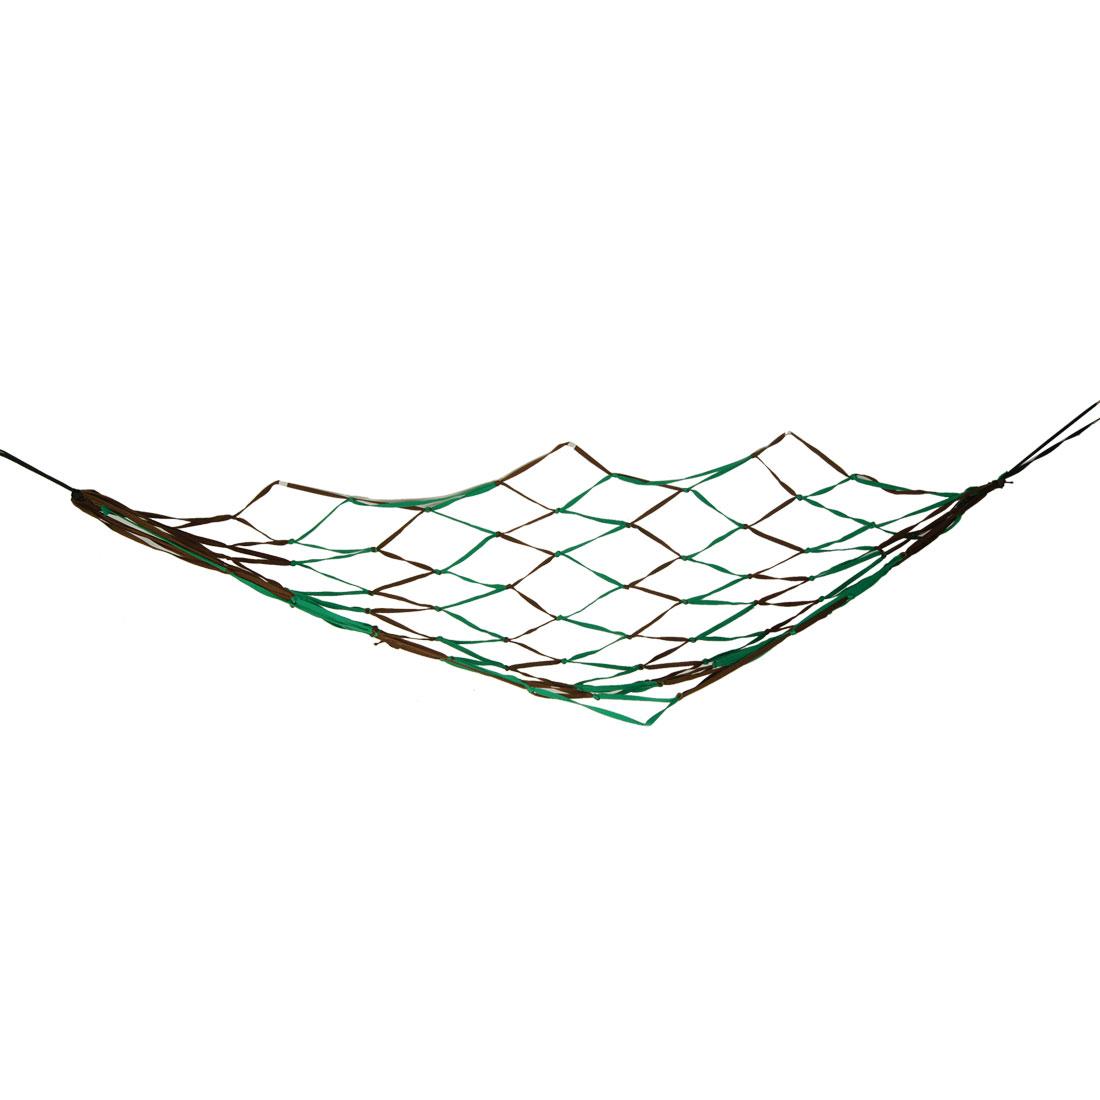 "Outdoor Travel Swing Hammock Mesh Net Nylon Sleeping Bed Green Brown 79"" x 43"""